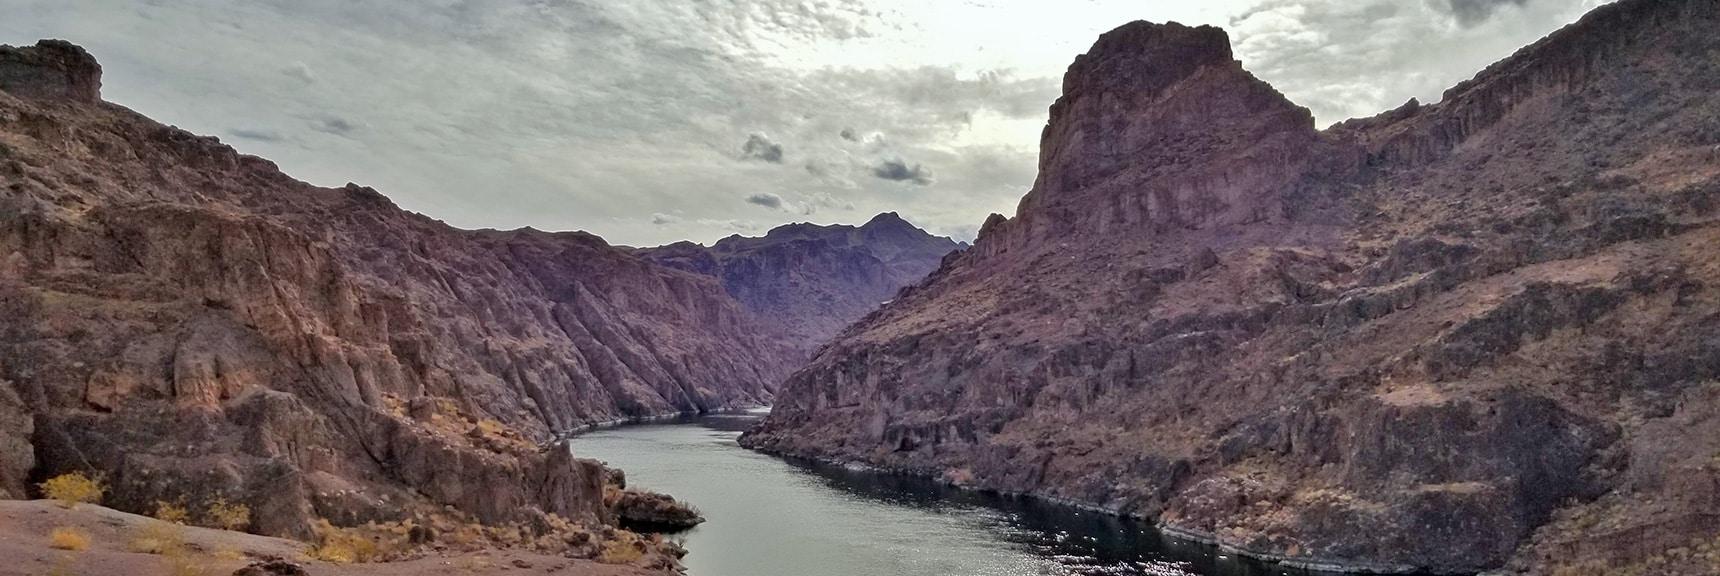 Colorado River Downstream View. | Arizona Hot Spring | Liberty Bell Arch | Lake Mead National Recreation Area, Arizona